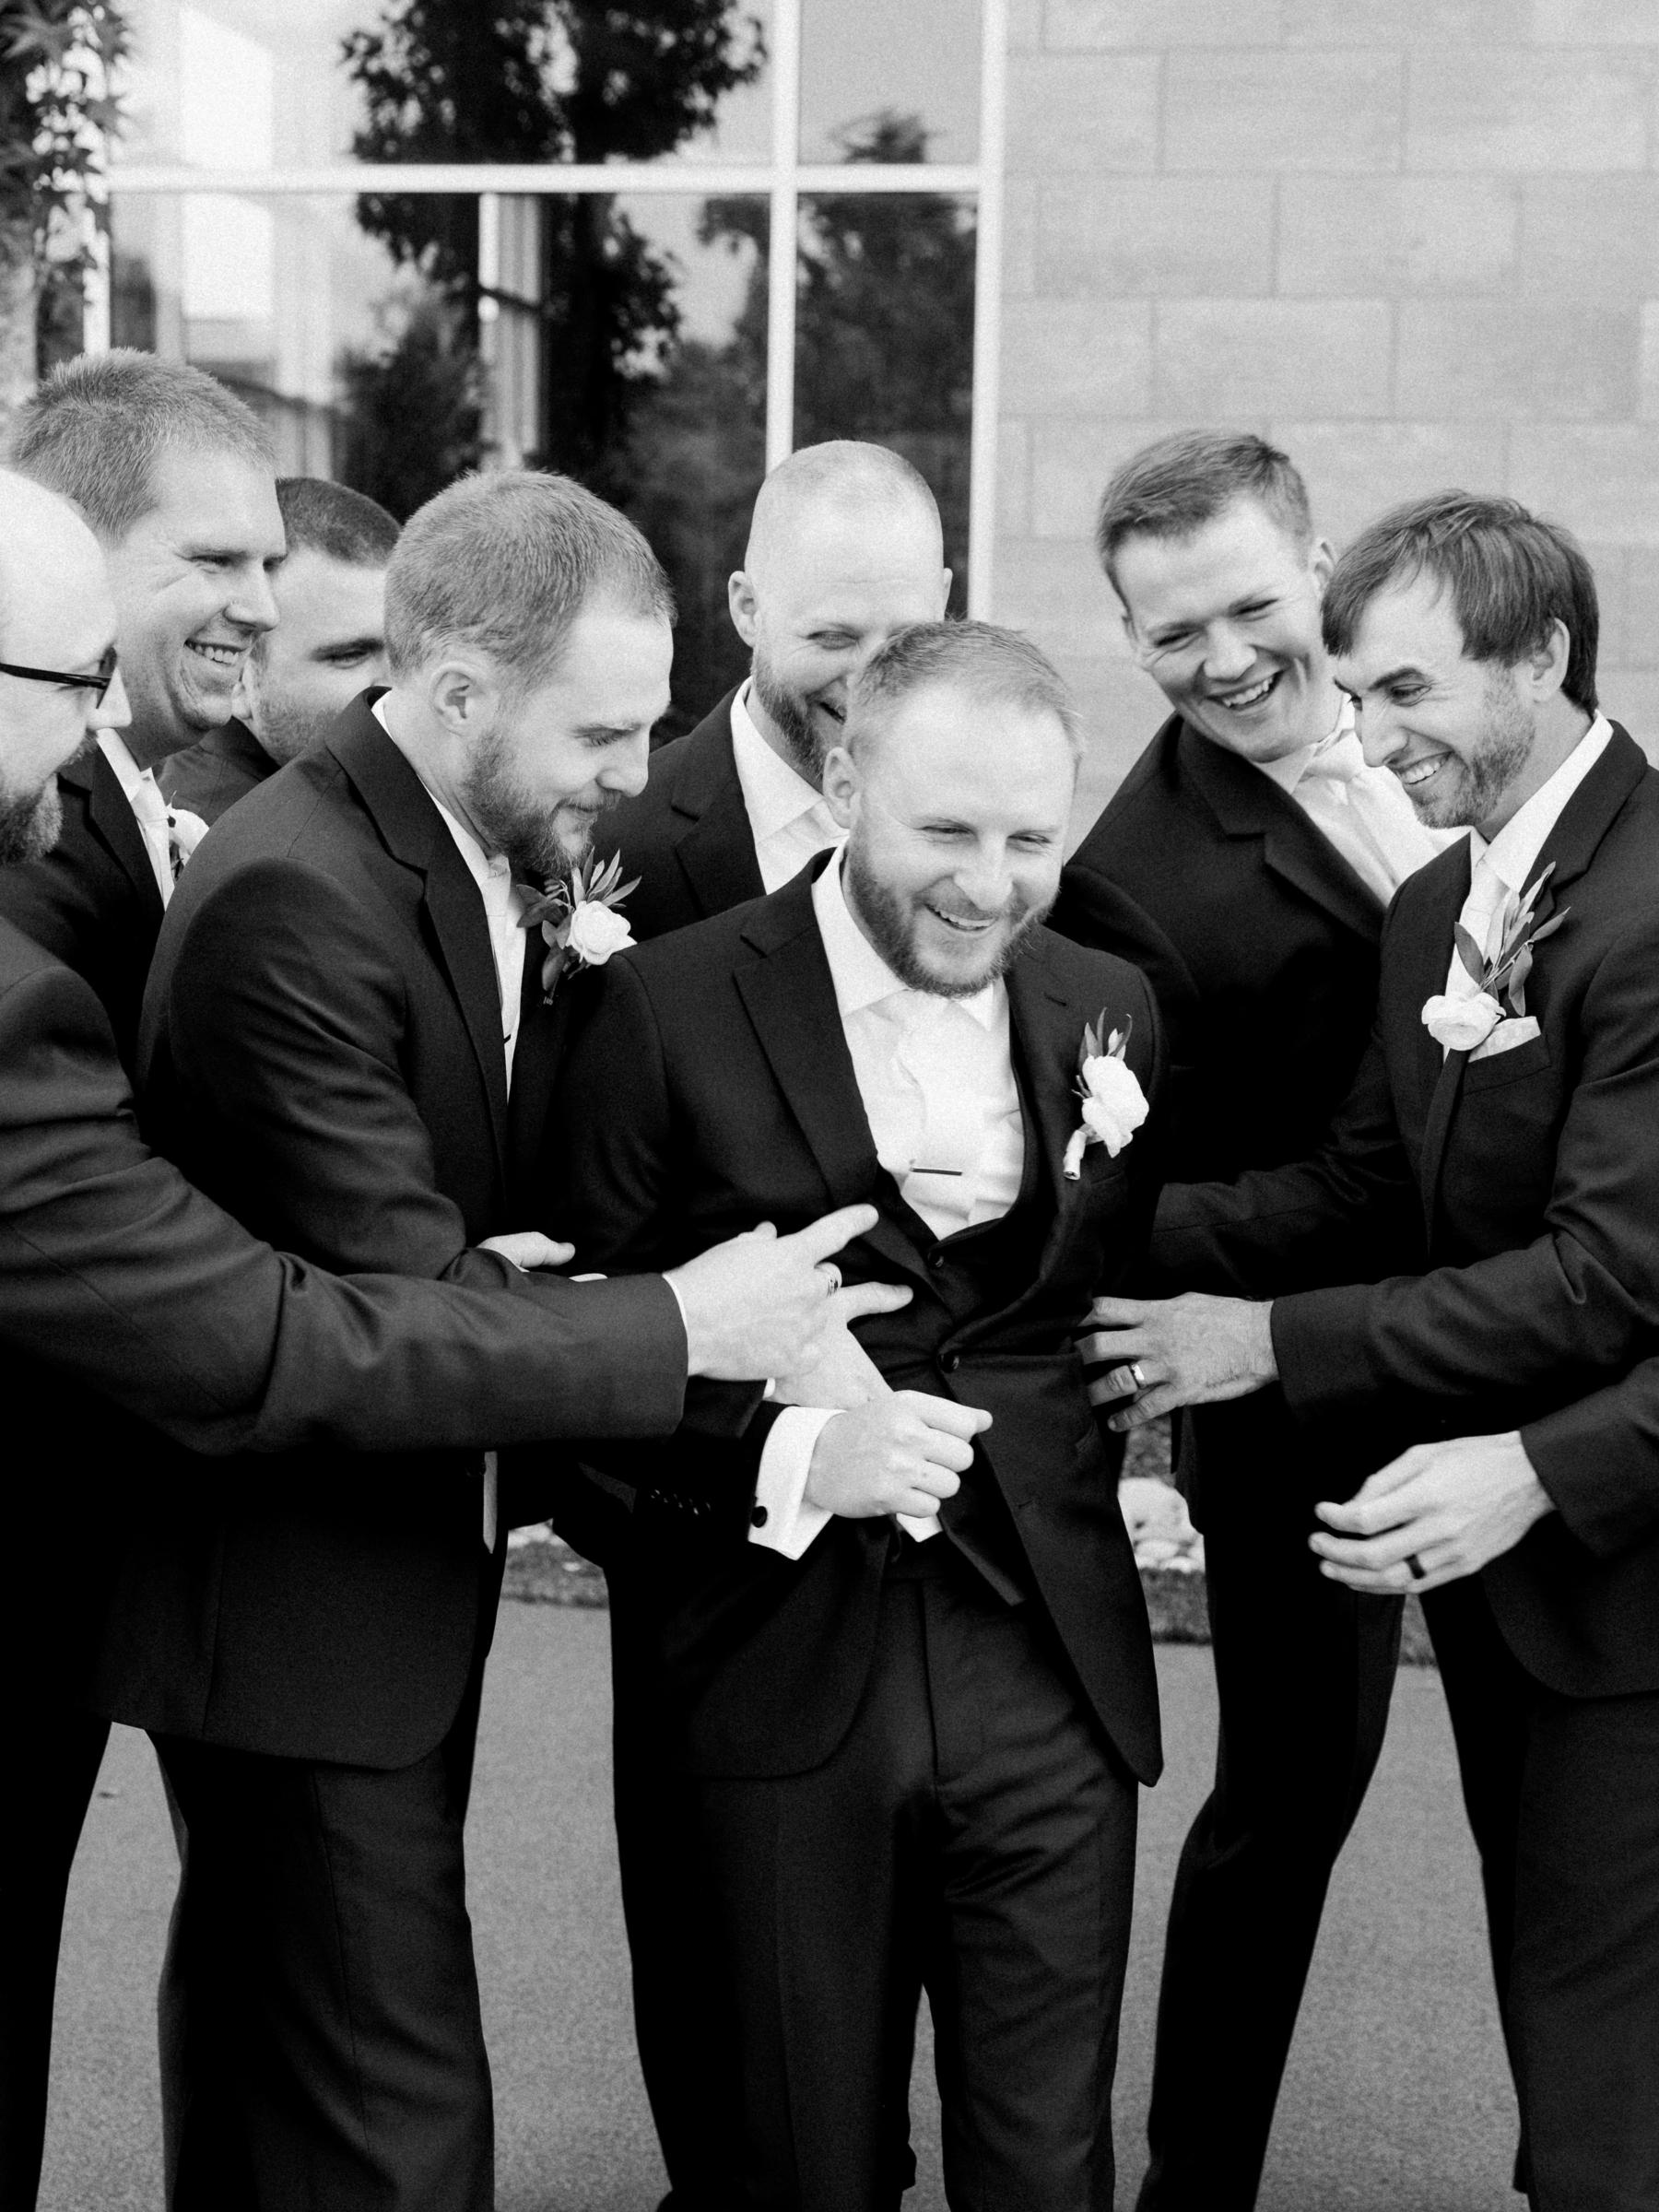 Black and white groomsman photo